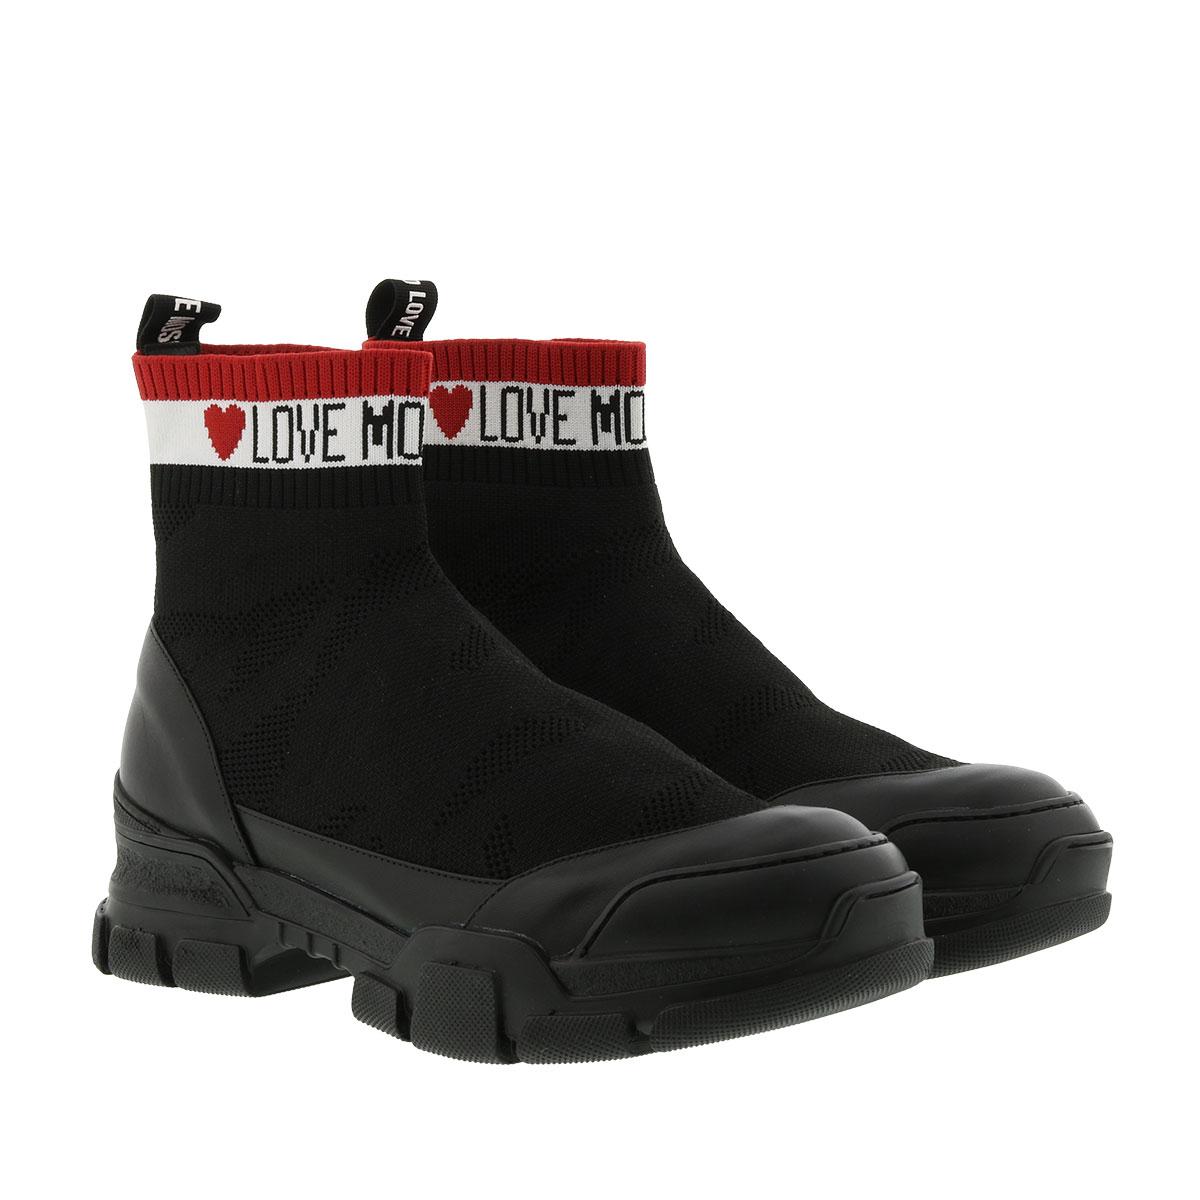 Love Moschino Sneakers - Sneaker High Heart Nero - in schwarz - für Damen